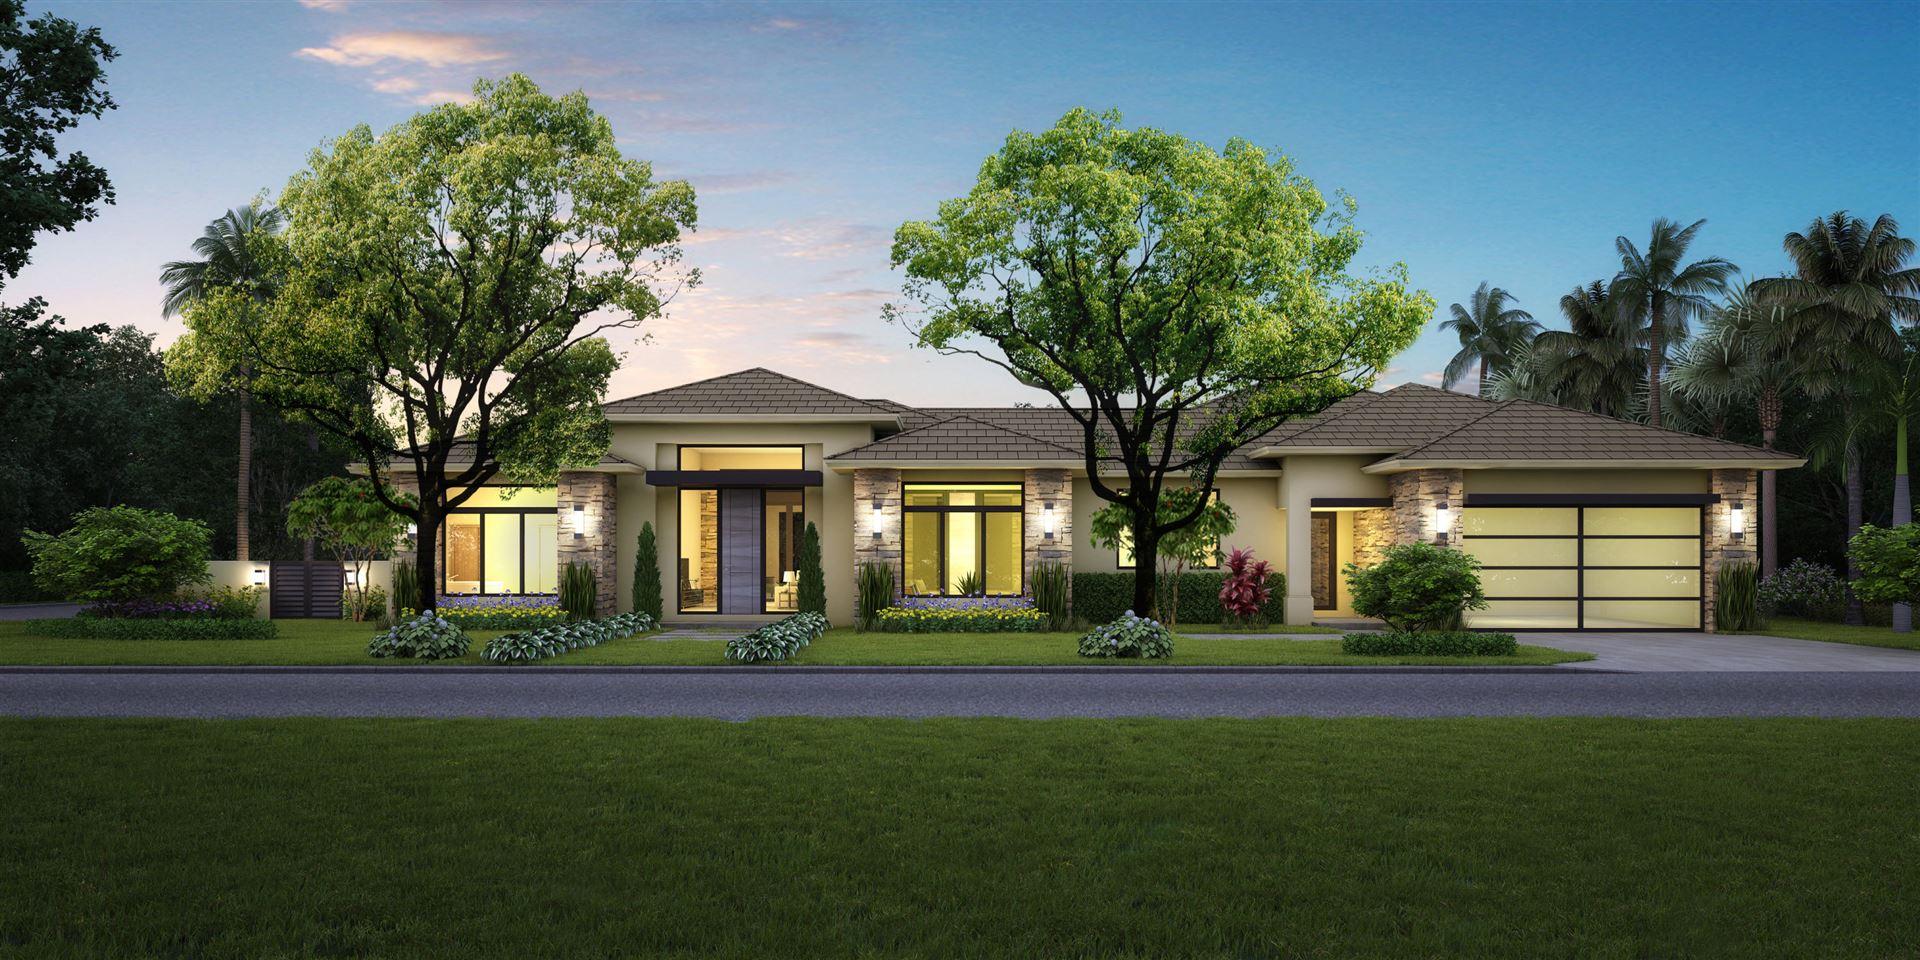 107 NW 9th Street, Delray Beach, FL 33444 - #: RX-10643628